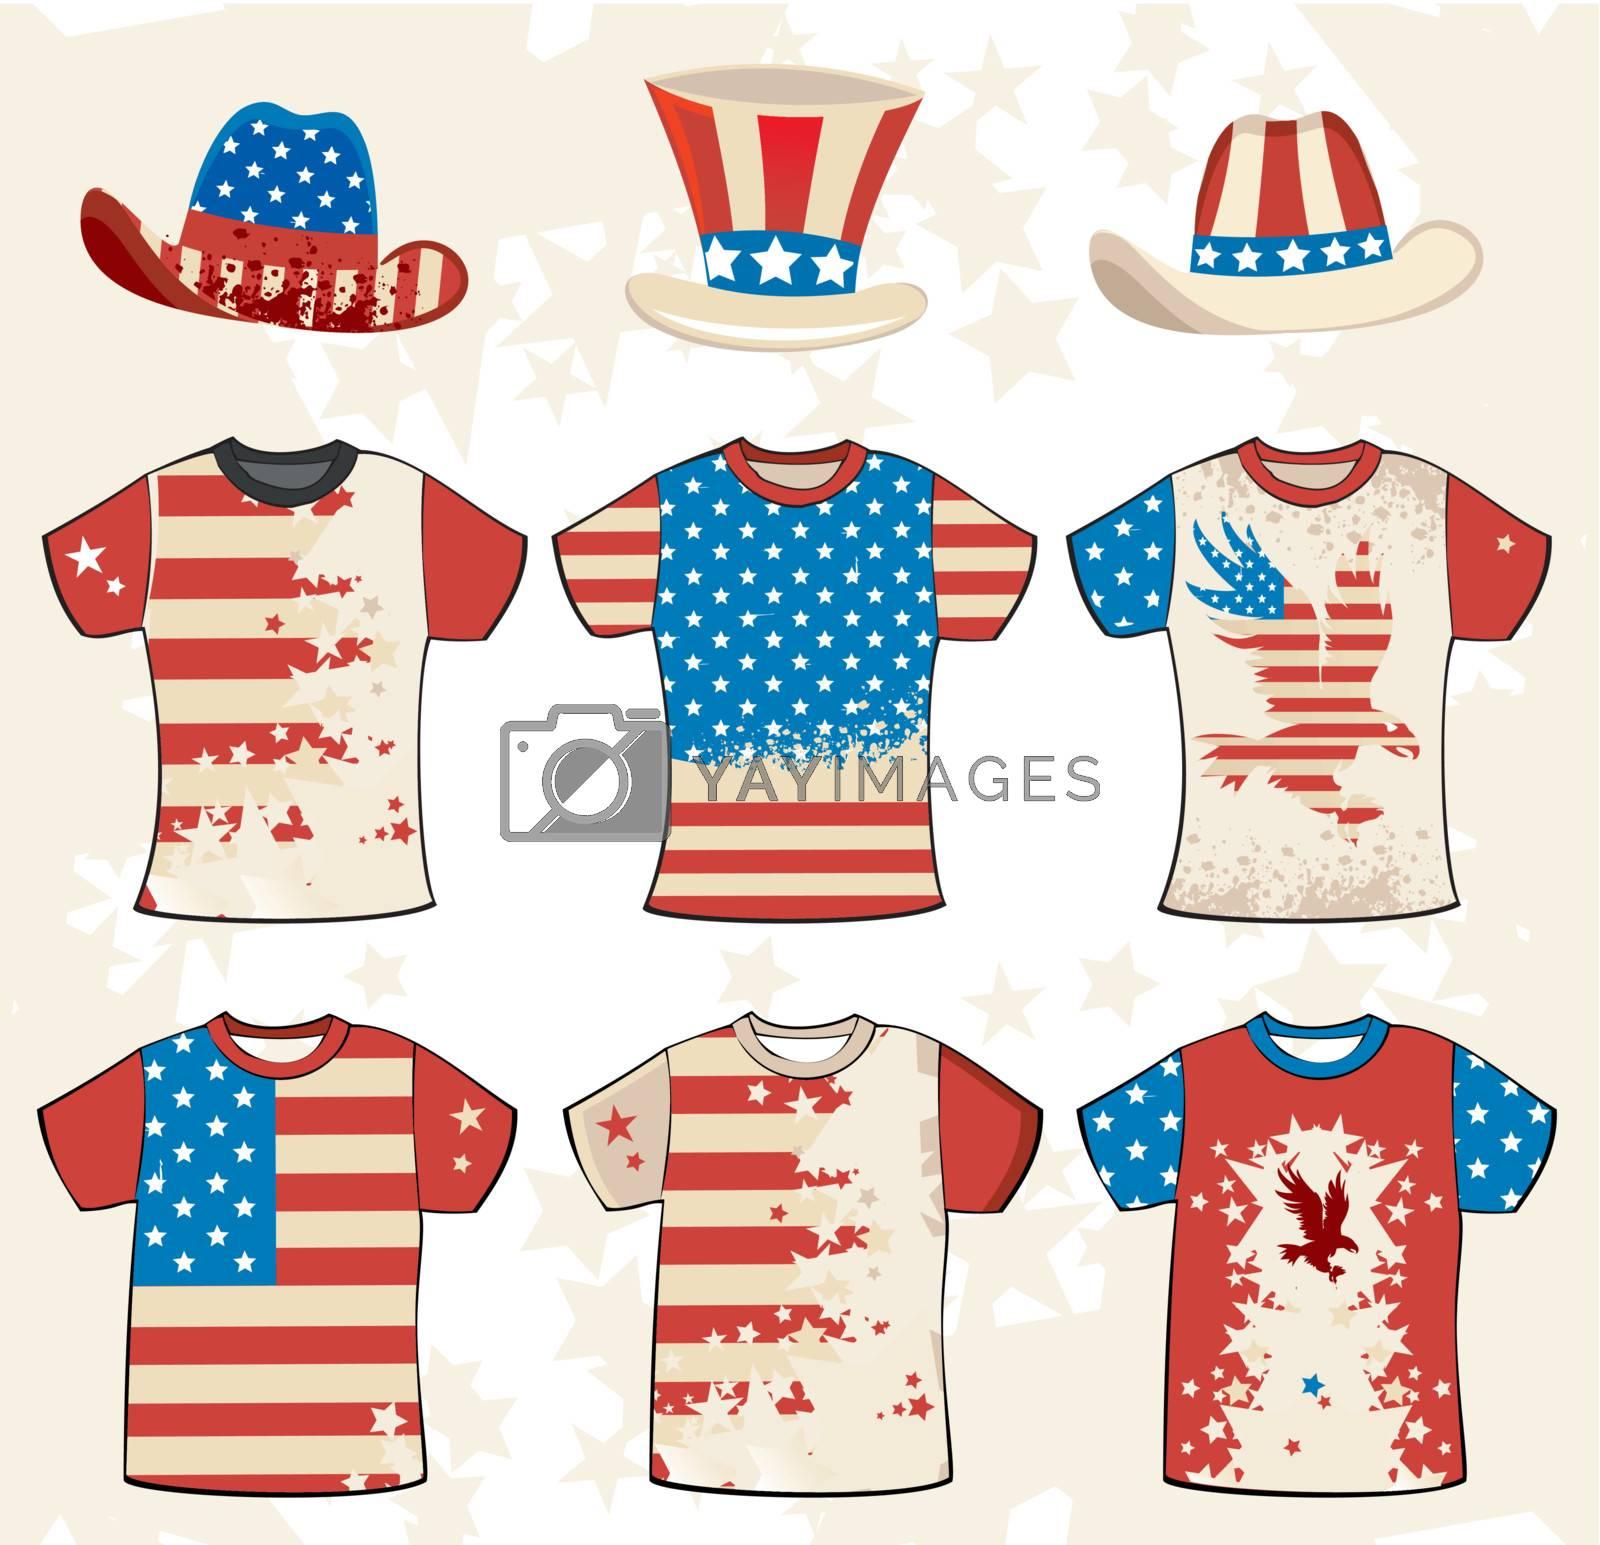 Royalty free image of Grunge american stylish t-shirt design 3 by dianka